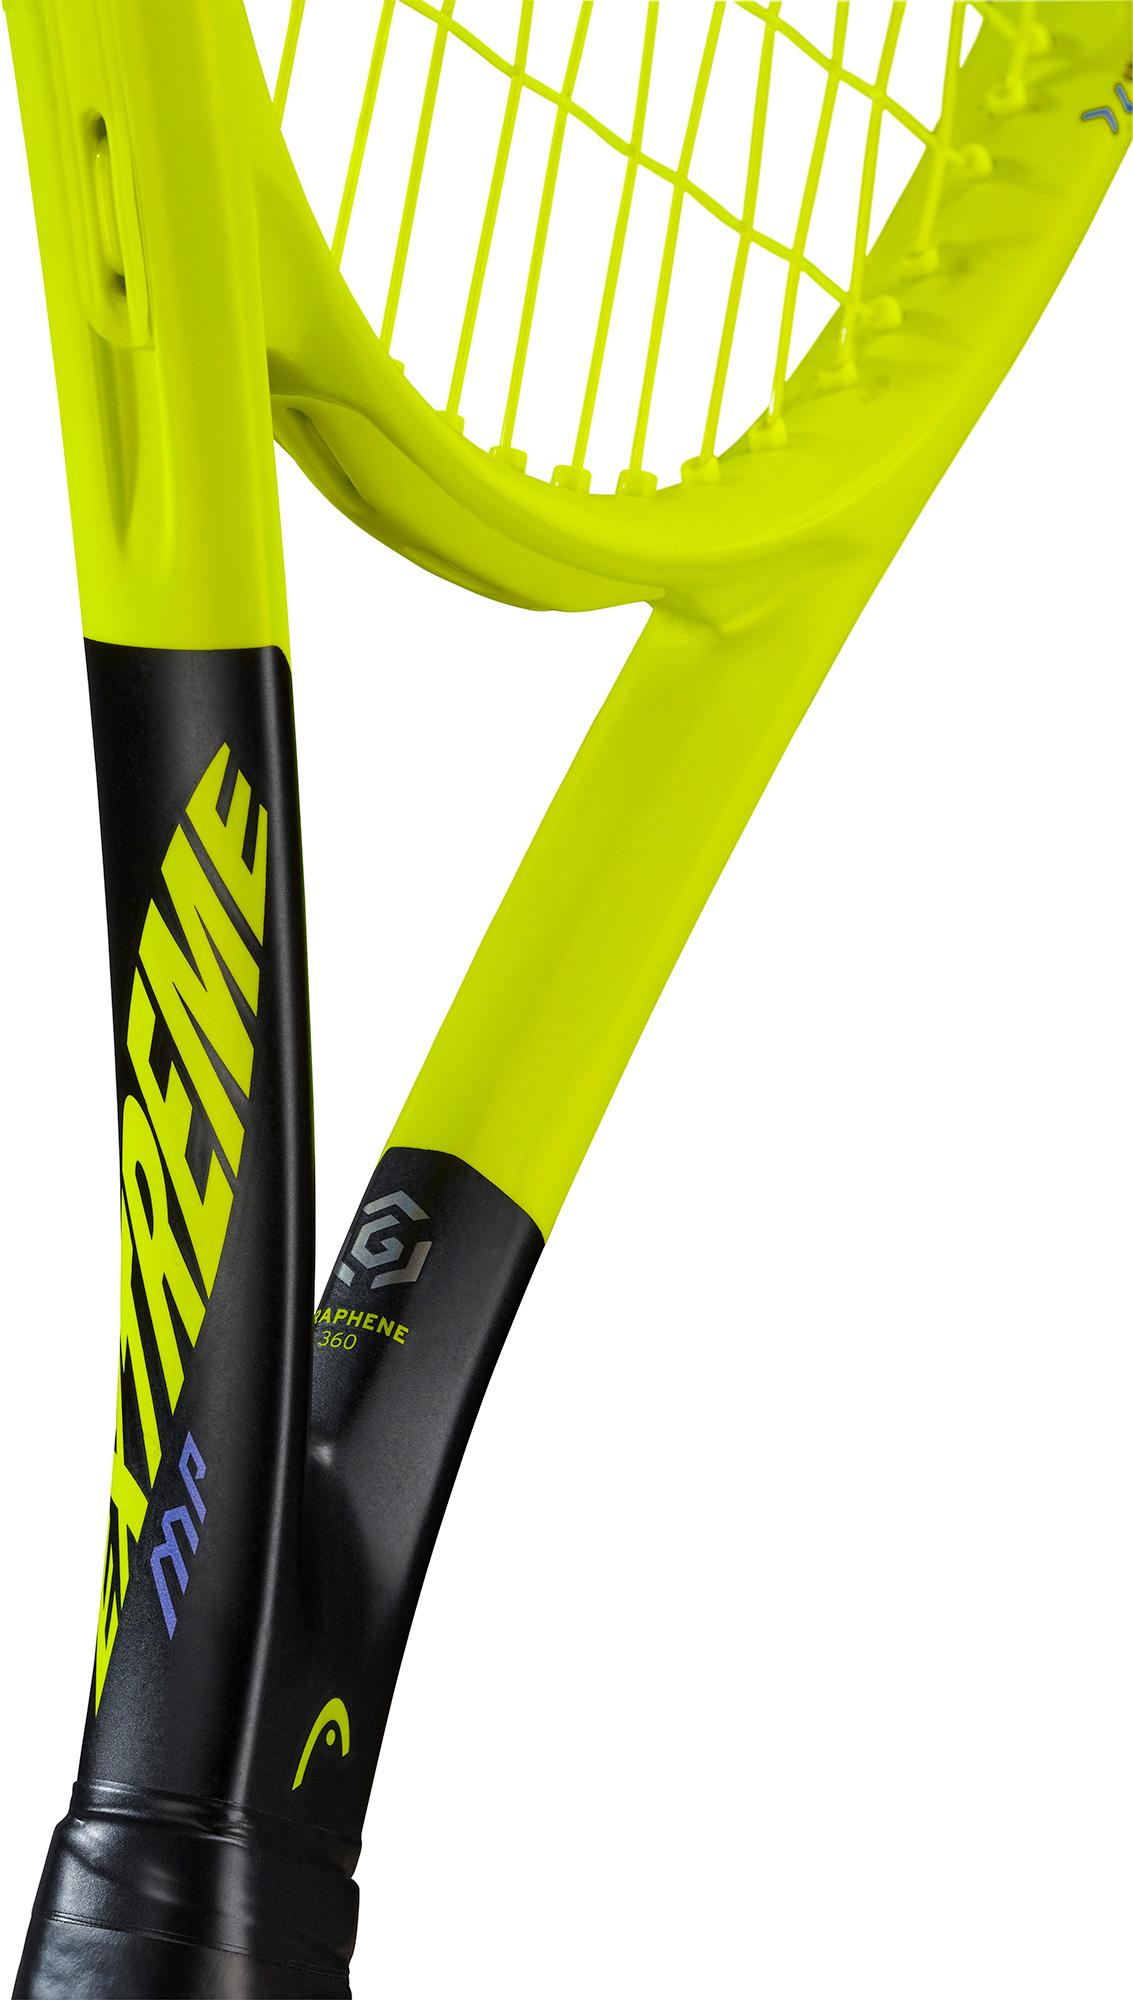 Head Graphene 360 Extreme MP Tennis Racket - Tennisnuts.com